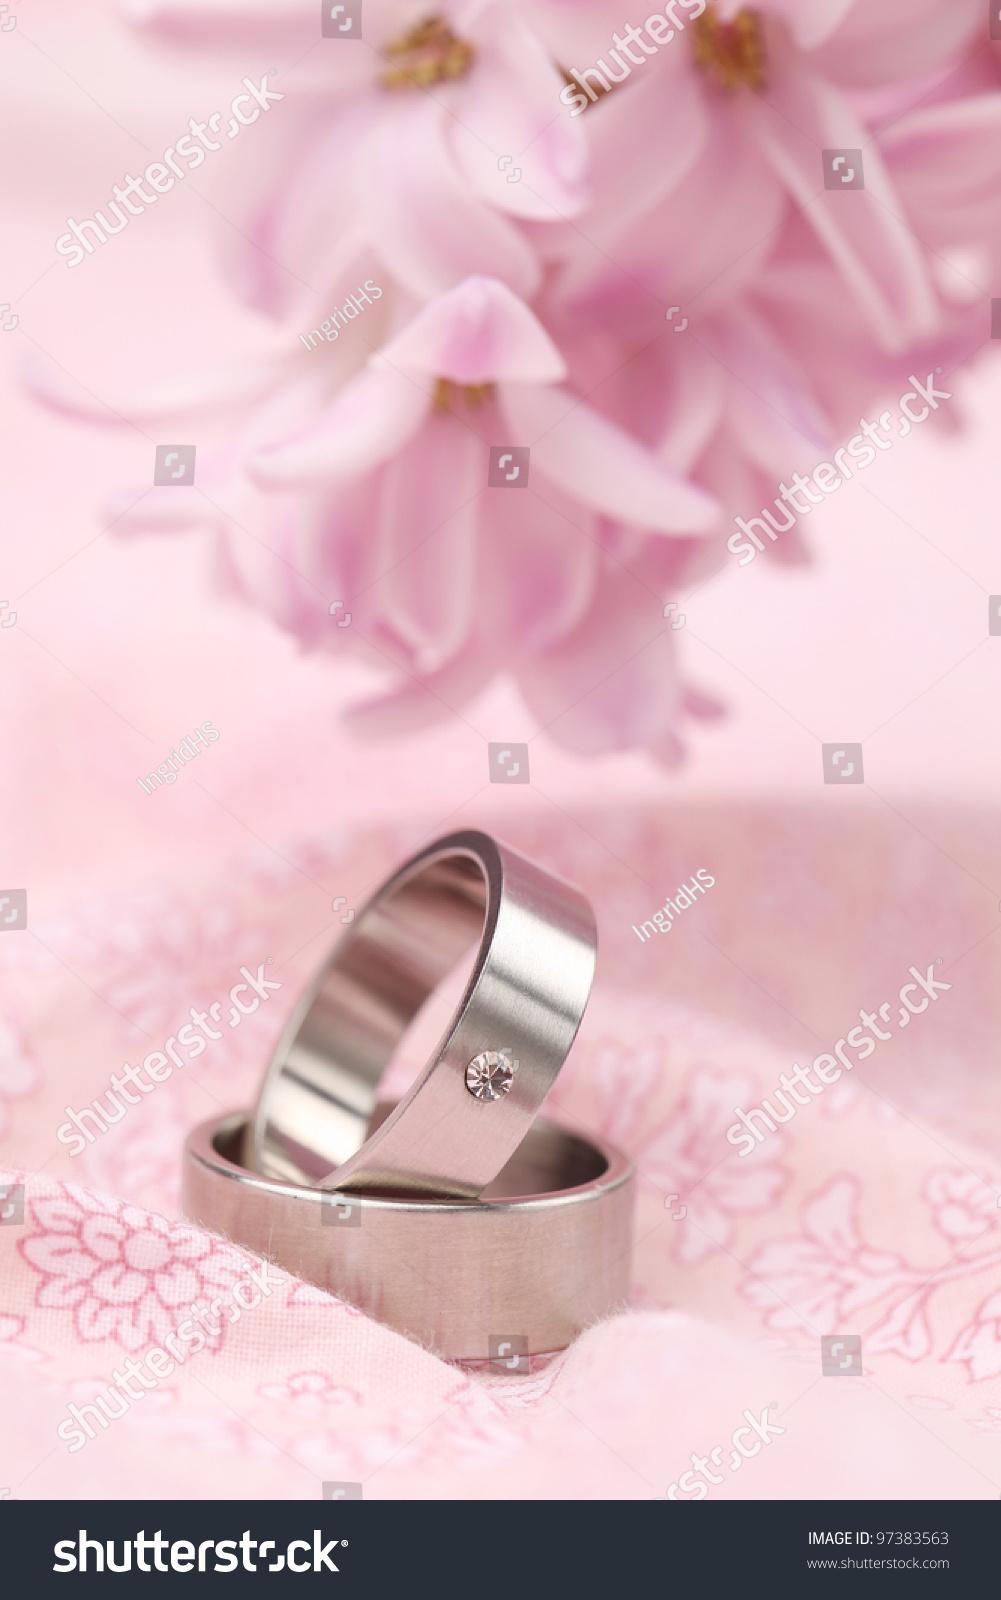 Titanium Wedding Rings On Pink Background Stock Photo (Edit Now ...